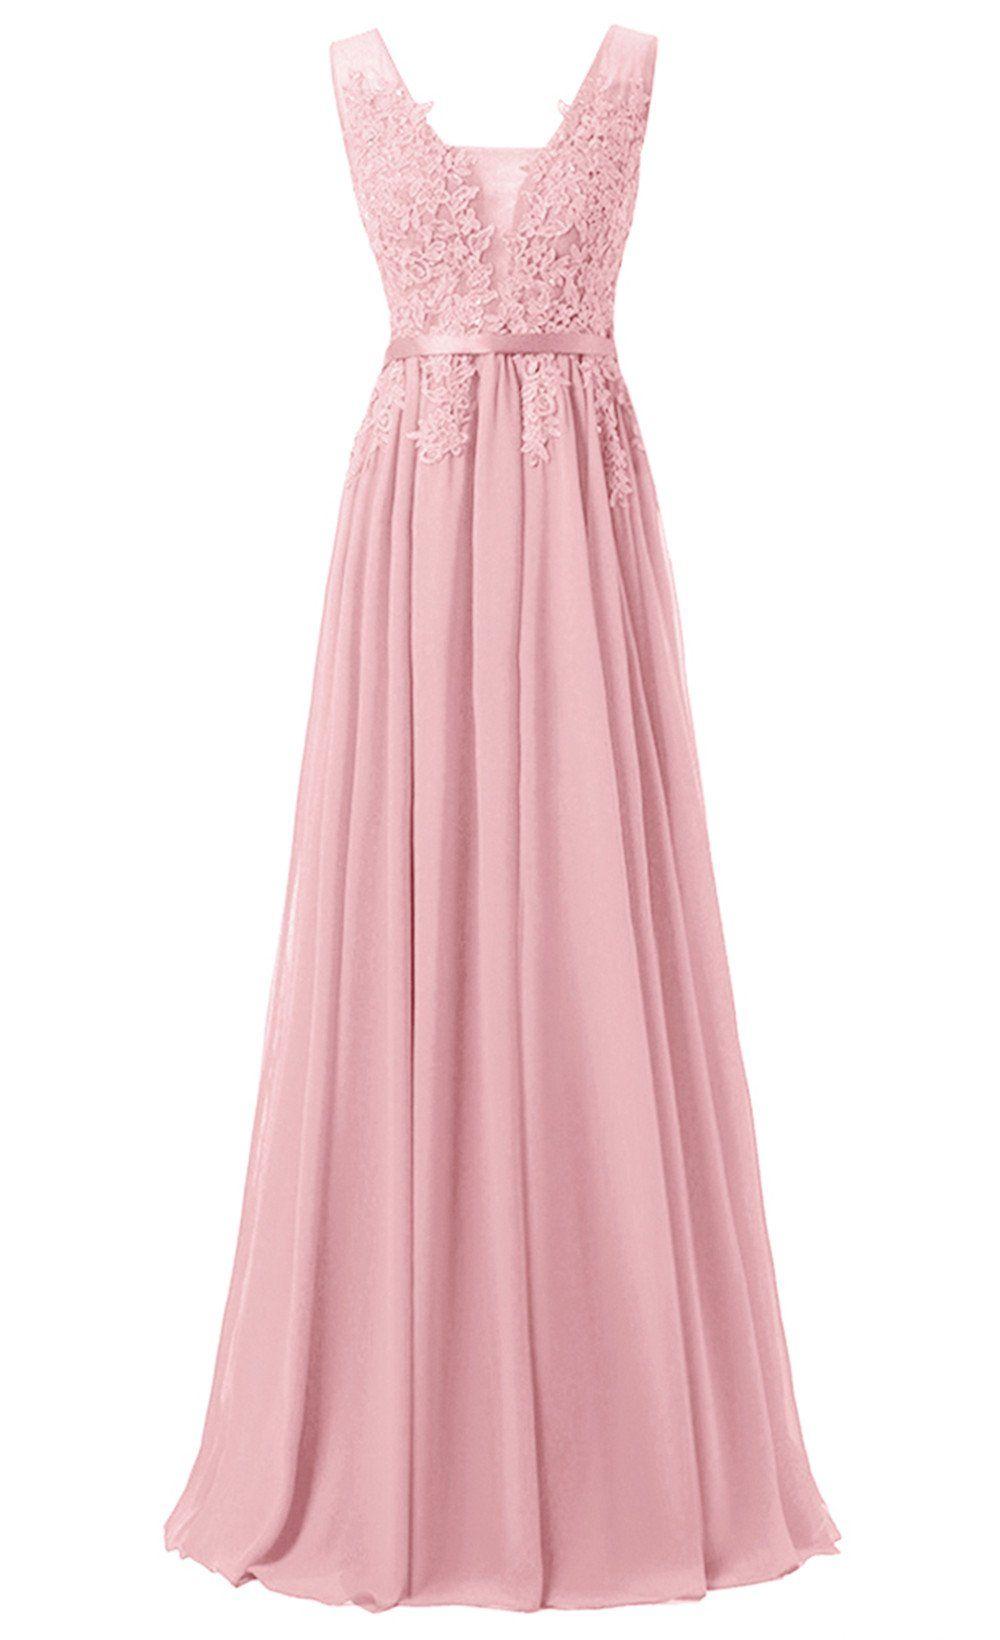 Lilis Graceful Chiffon Appliques Bridesmaid Dress Backless Floor-length Evening Gowns